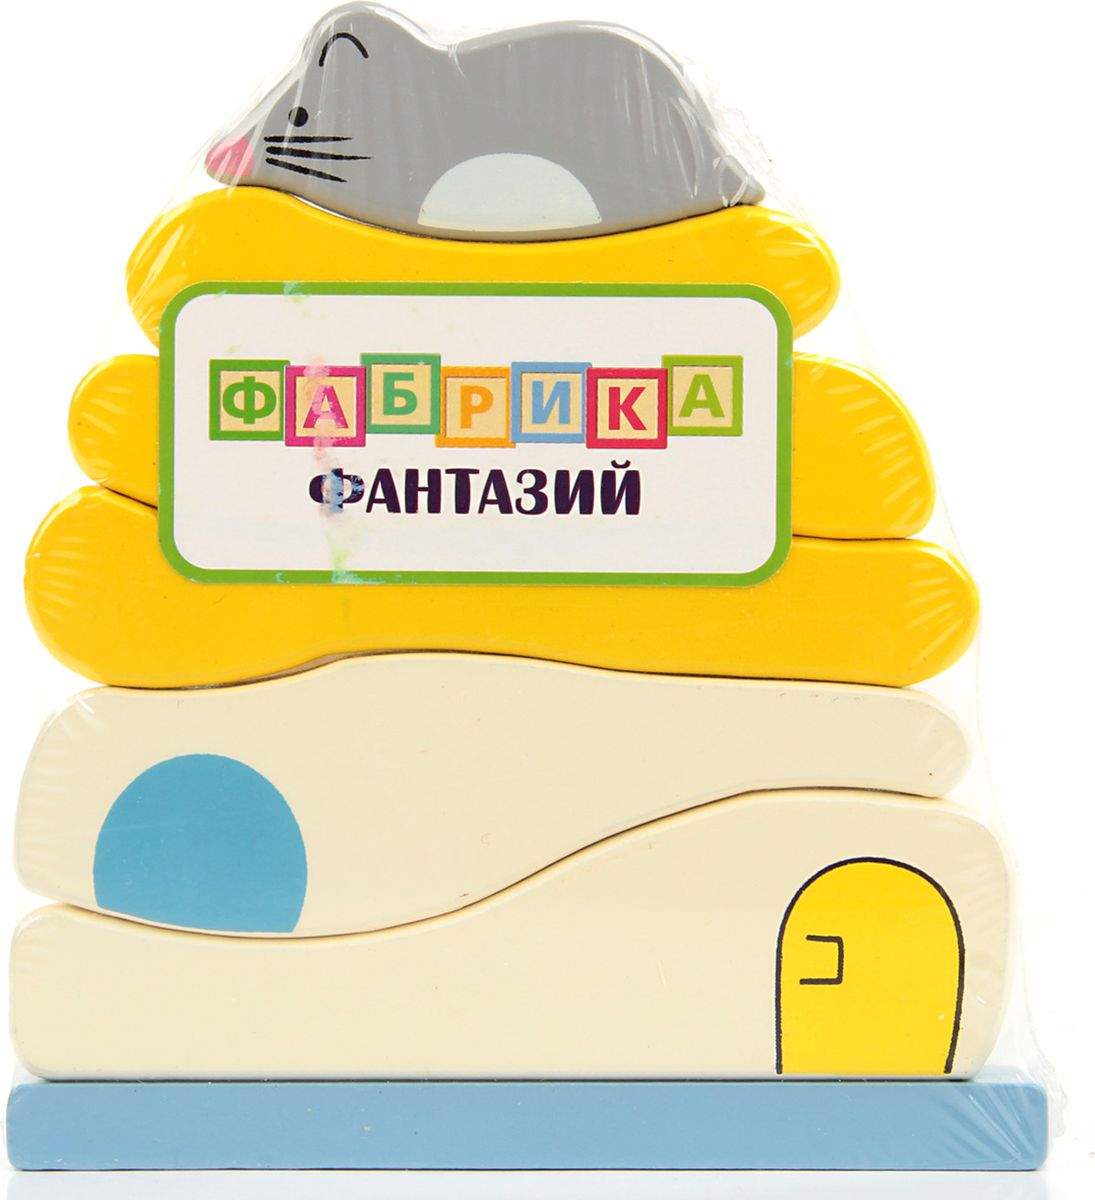 Фабрика Фантазий Развивающая игрушка Баланс 60094